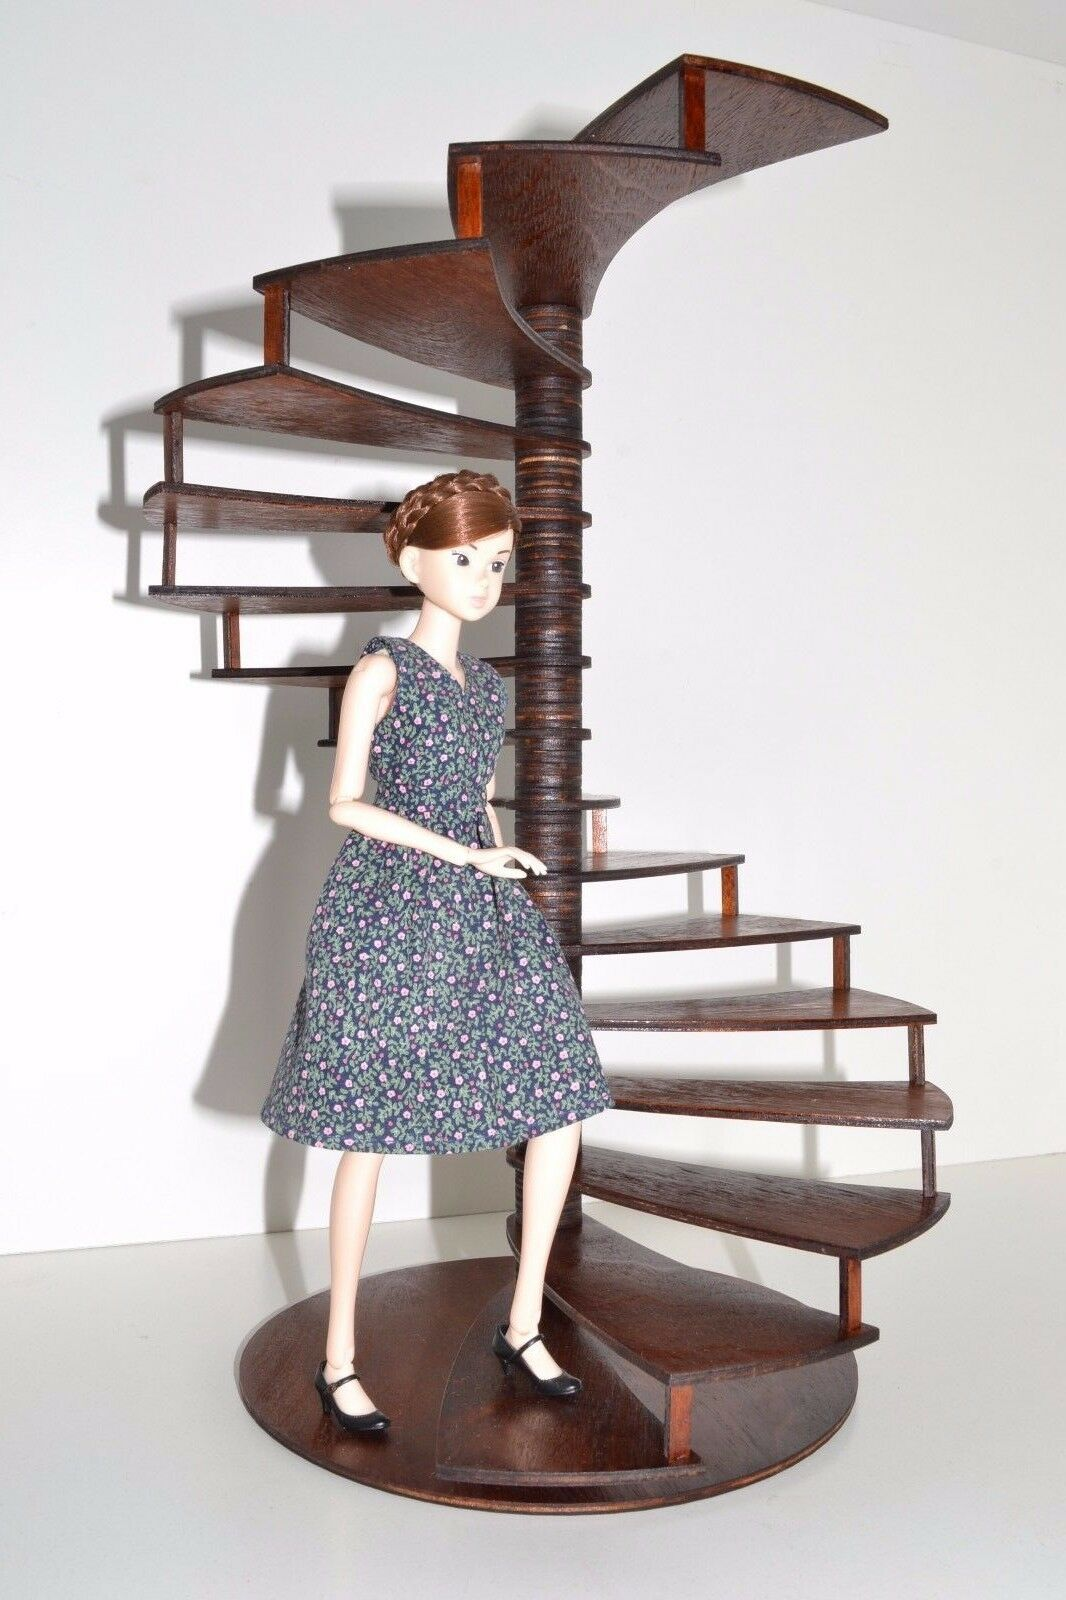 Espiral escalera Escaleras Muebles para muñeca Barbie FR 1 6 12 pulgadas de madera Diorama